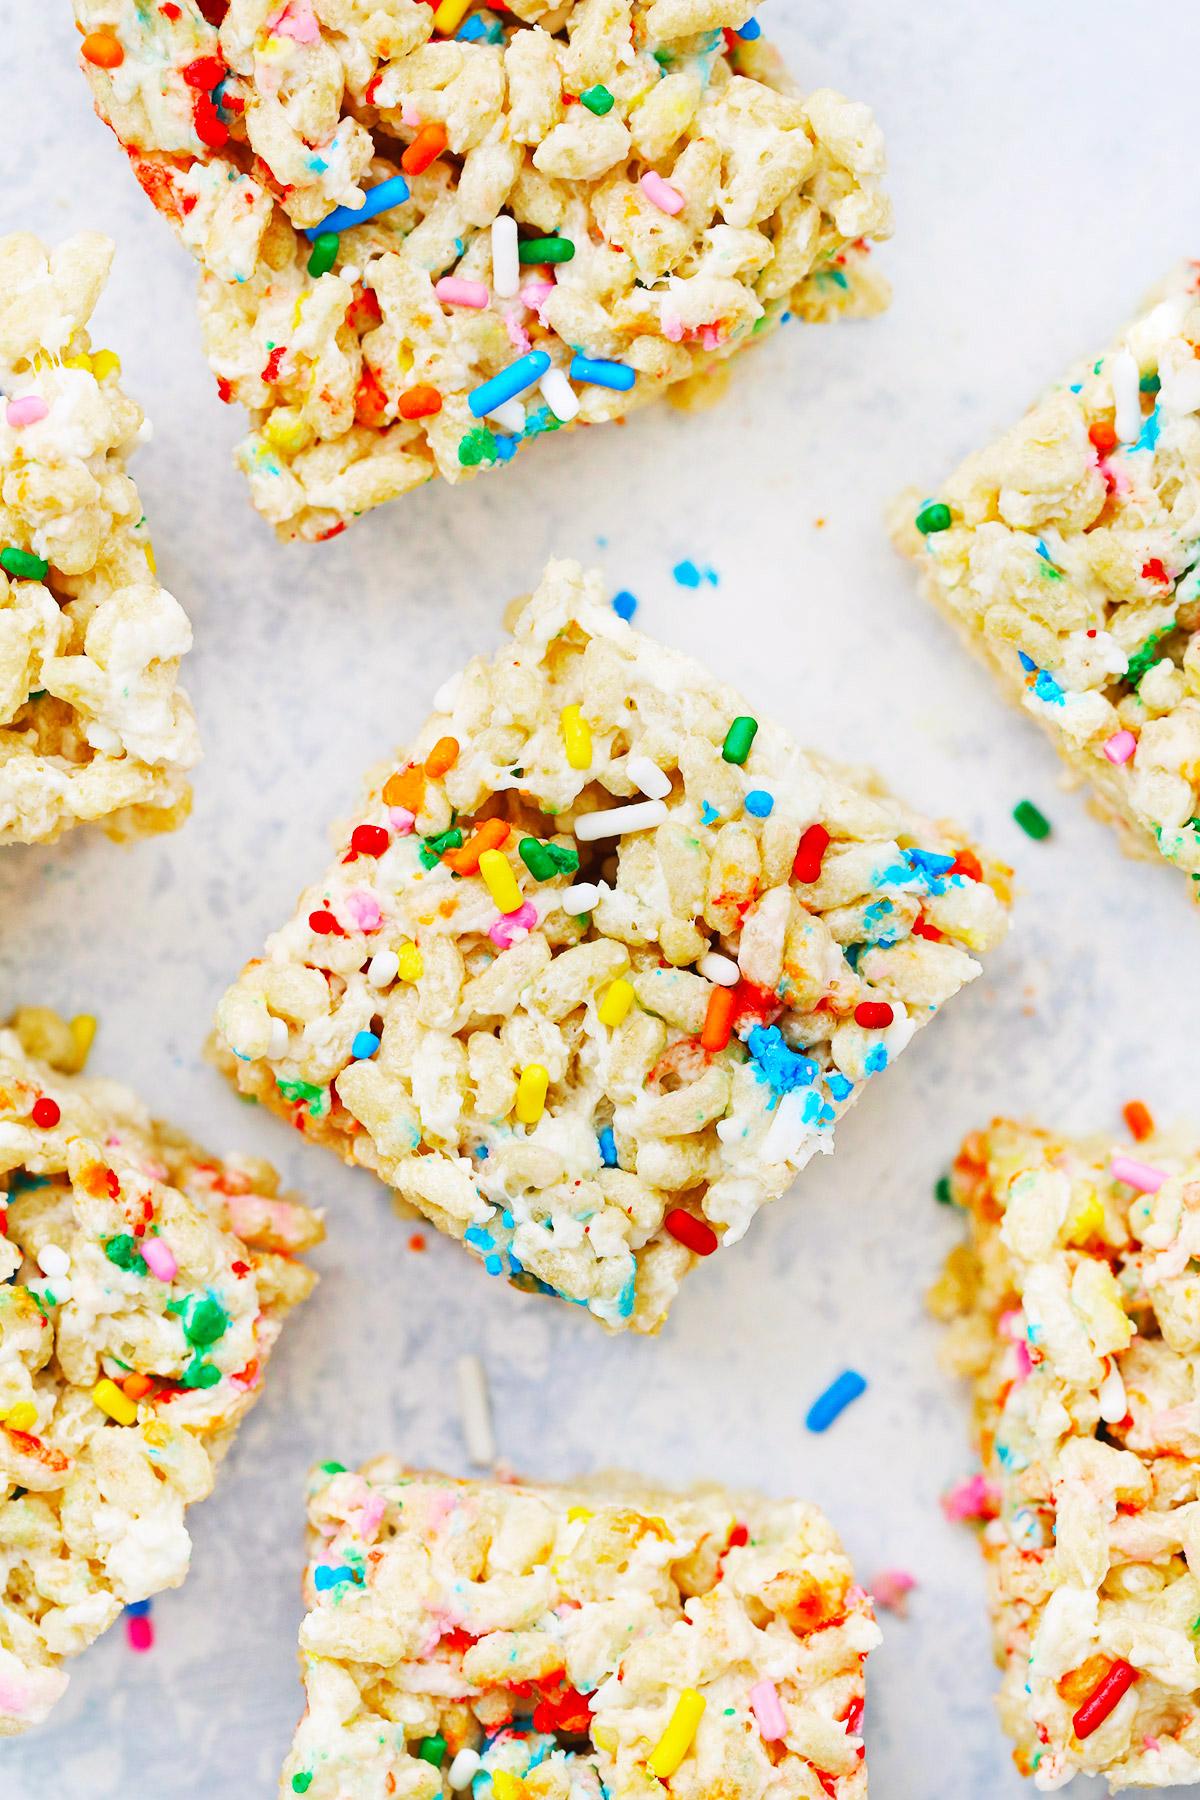 Swell Funfetti Birthday Cake Rice Krispies Treats Gluten Free Vegan Birthday Cards Printable Inklcafe Filternl